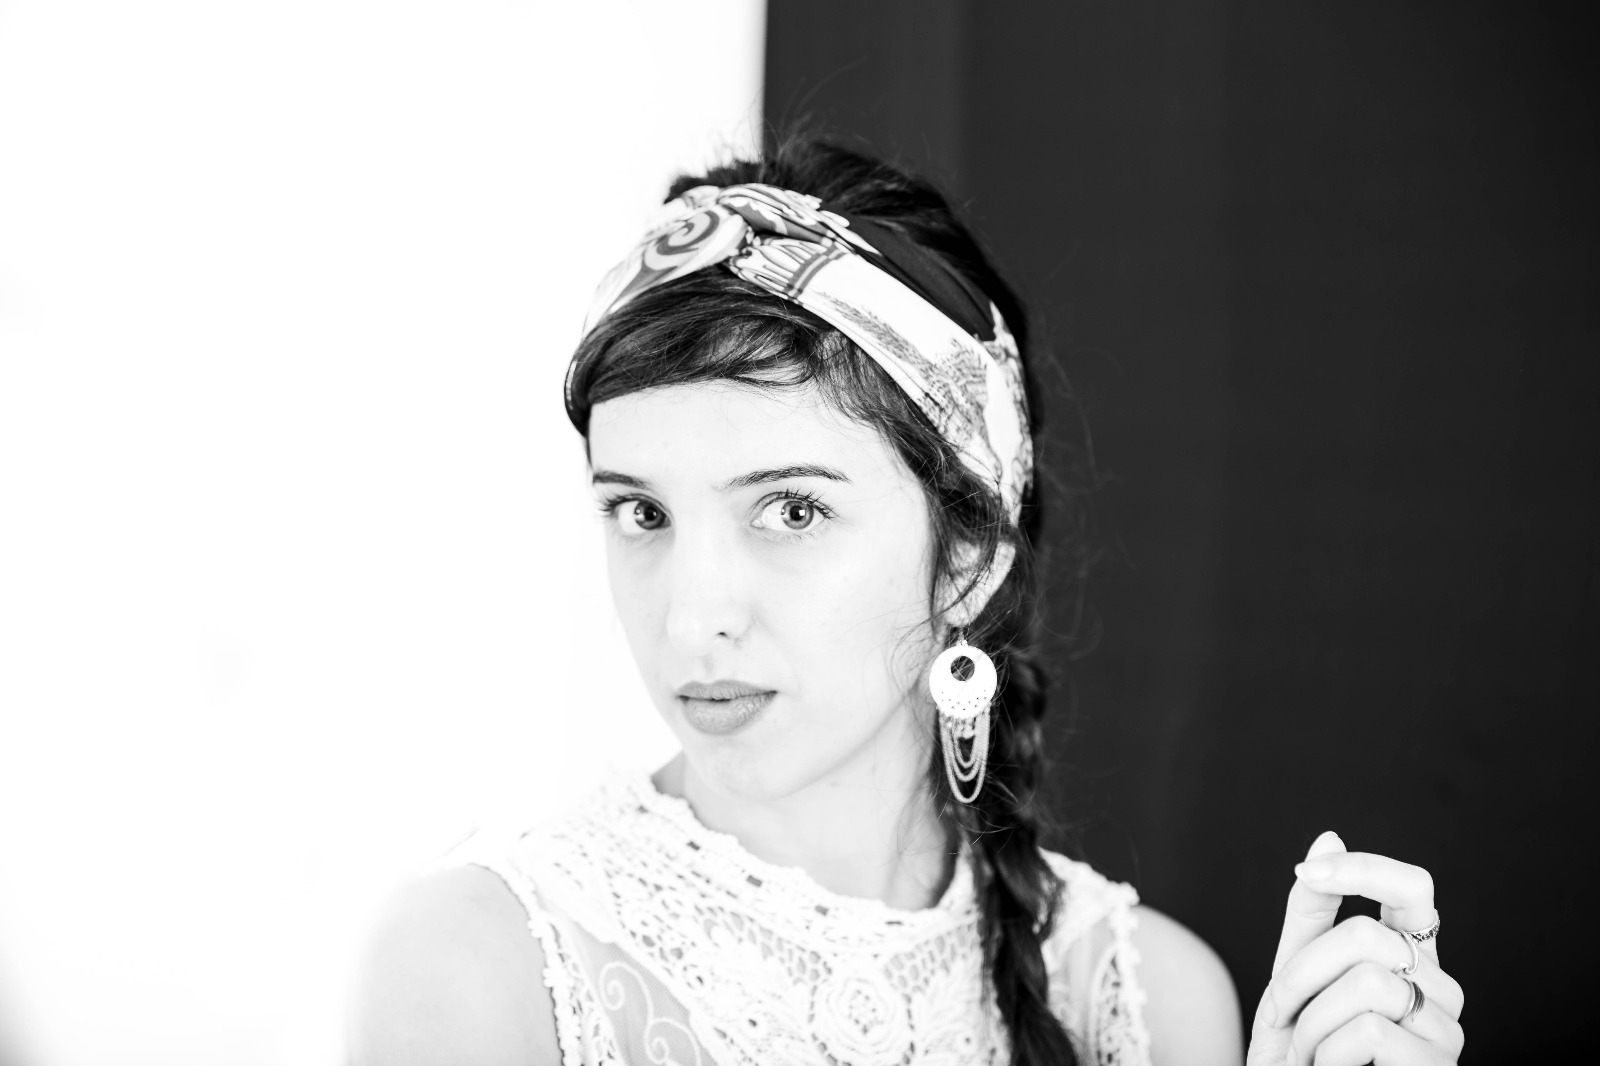 Khawla Ibrahim